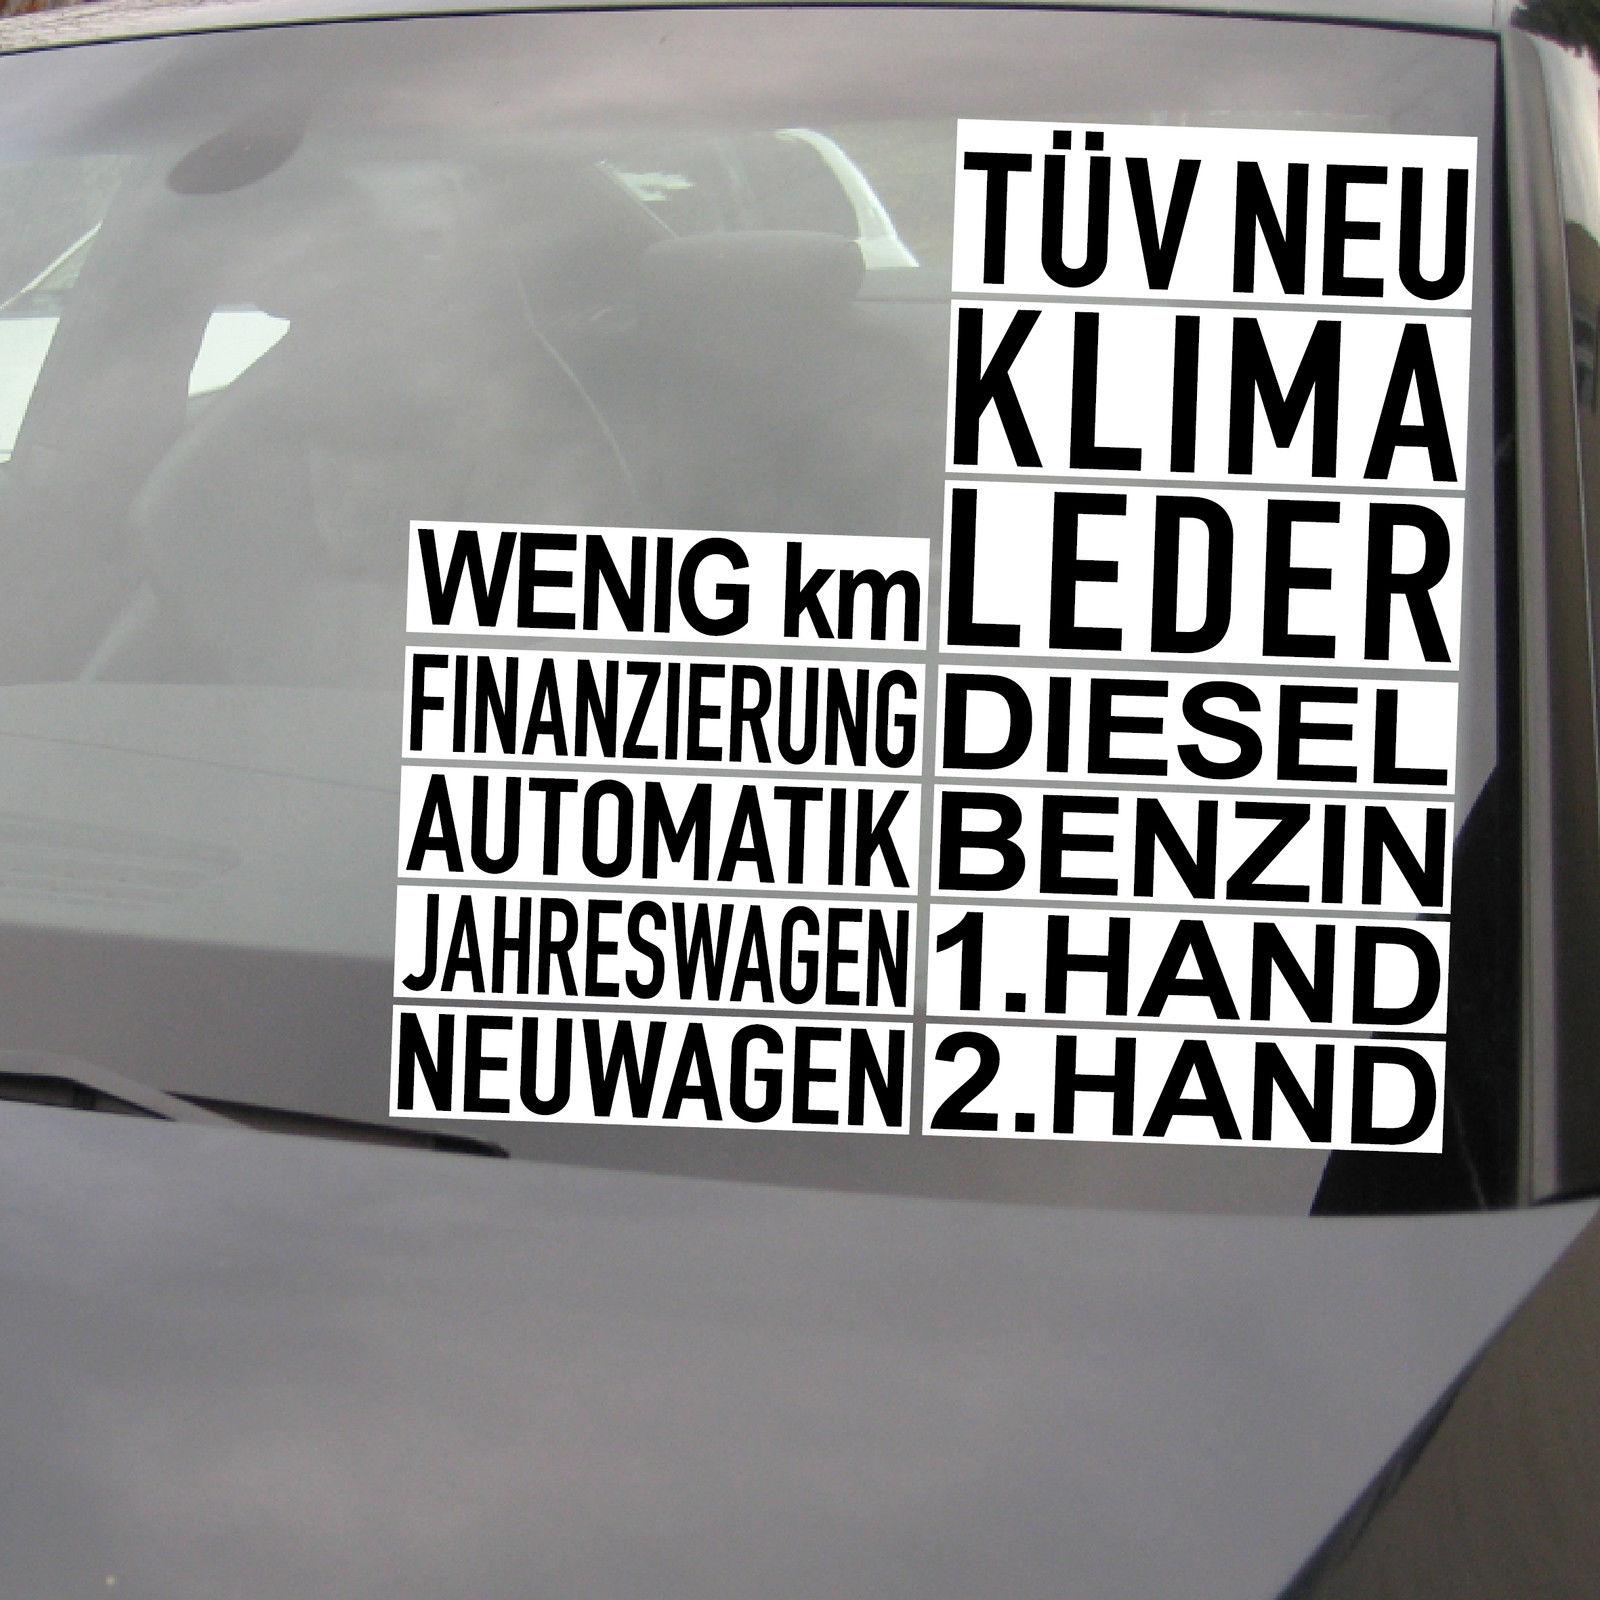 100 Aufkleber Auto Verkauf Leder Klima Tuv Automatik Diesel Benzin